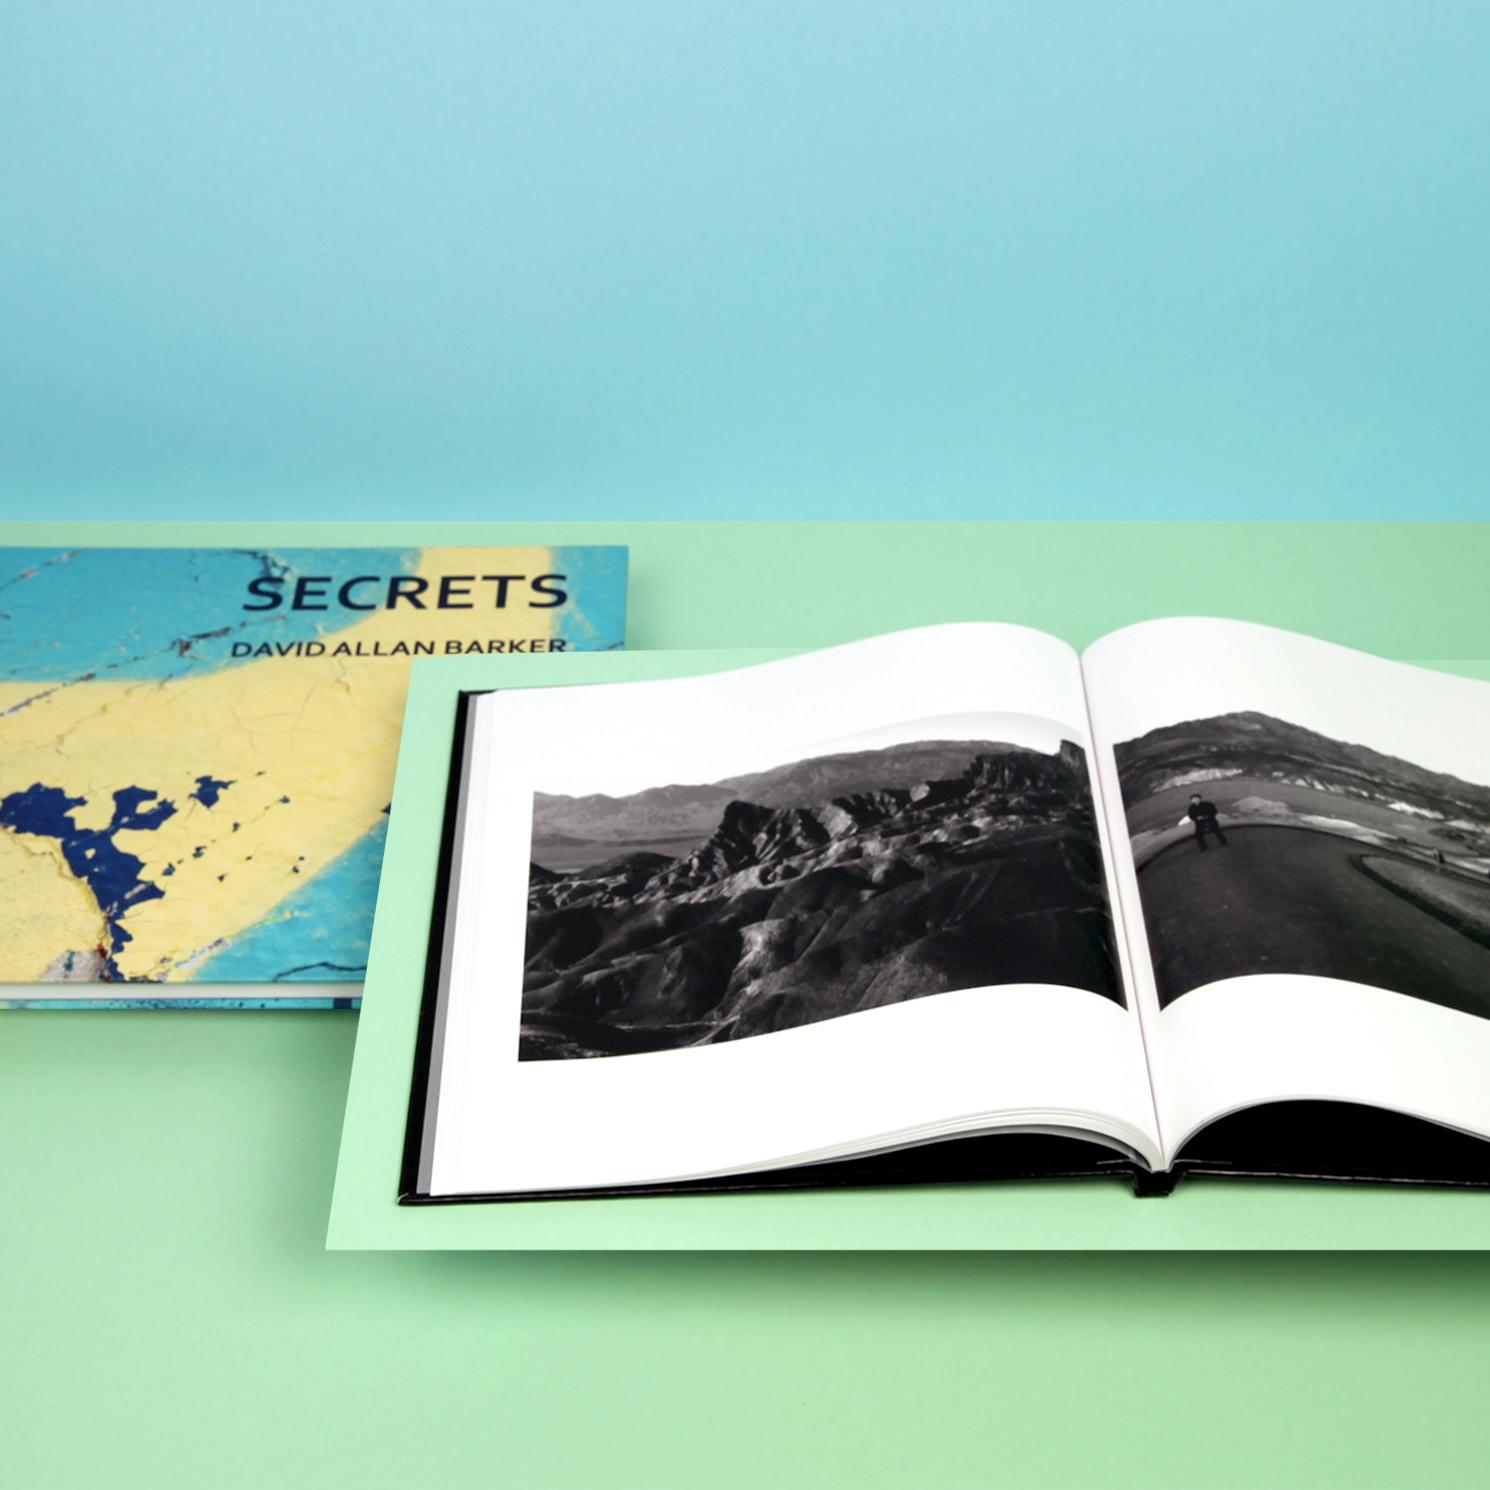 The classic photobook imagewrap cover